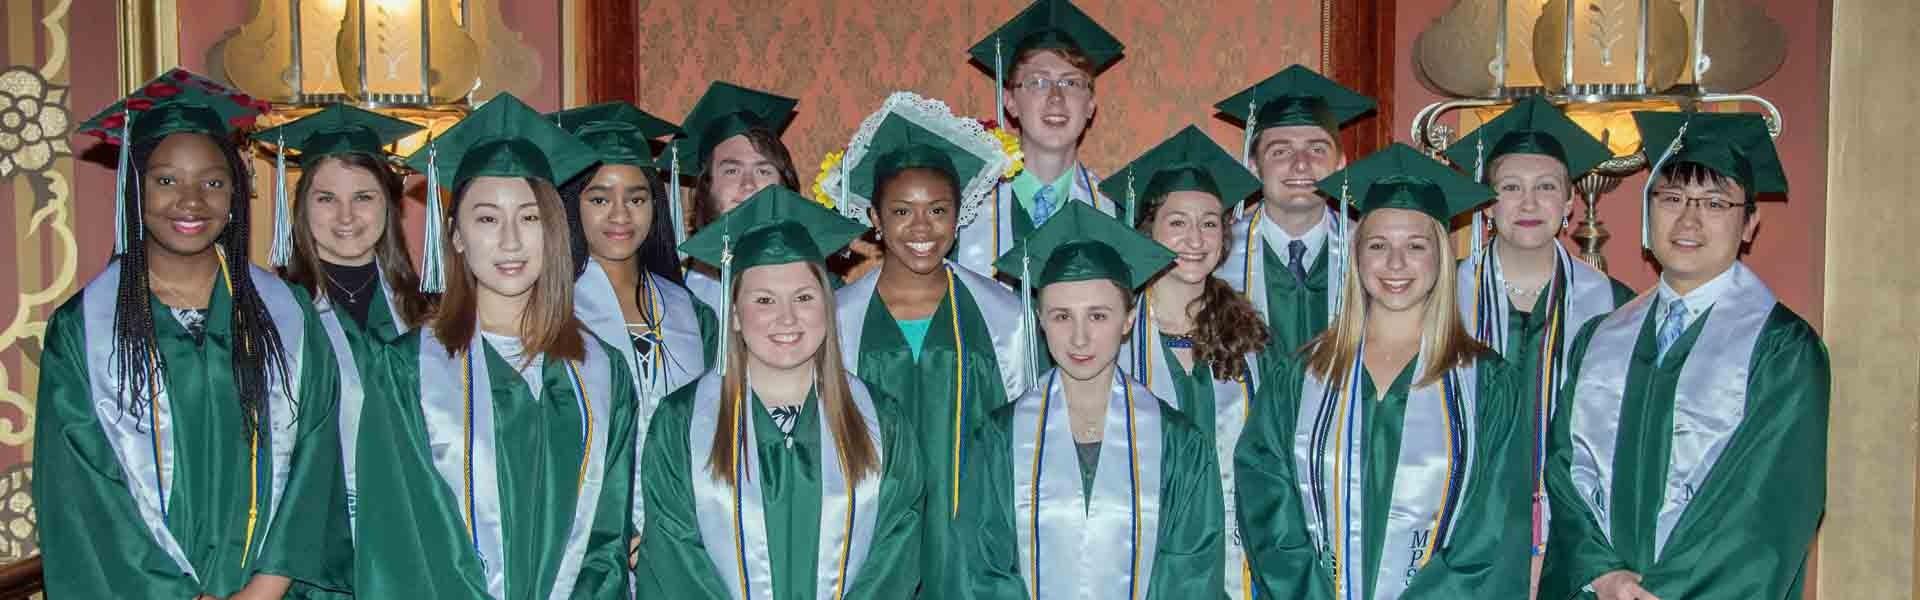 Mercyhurst Pennsylvania USA Graduation2 Banner 2019